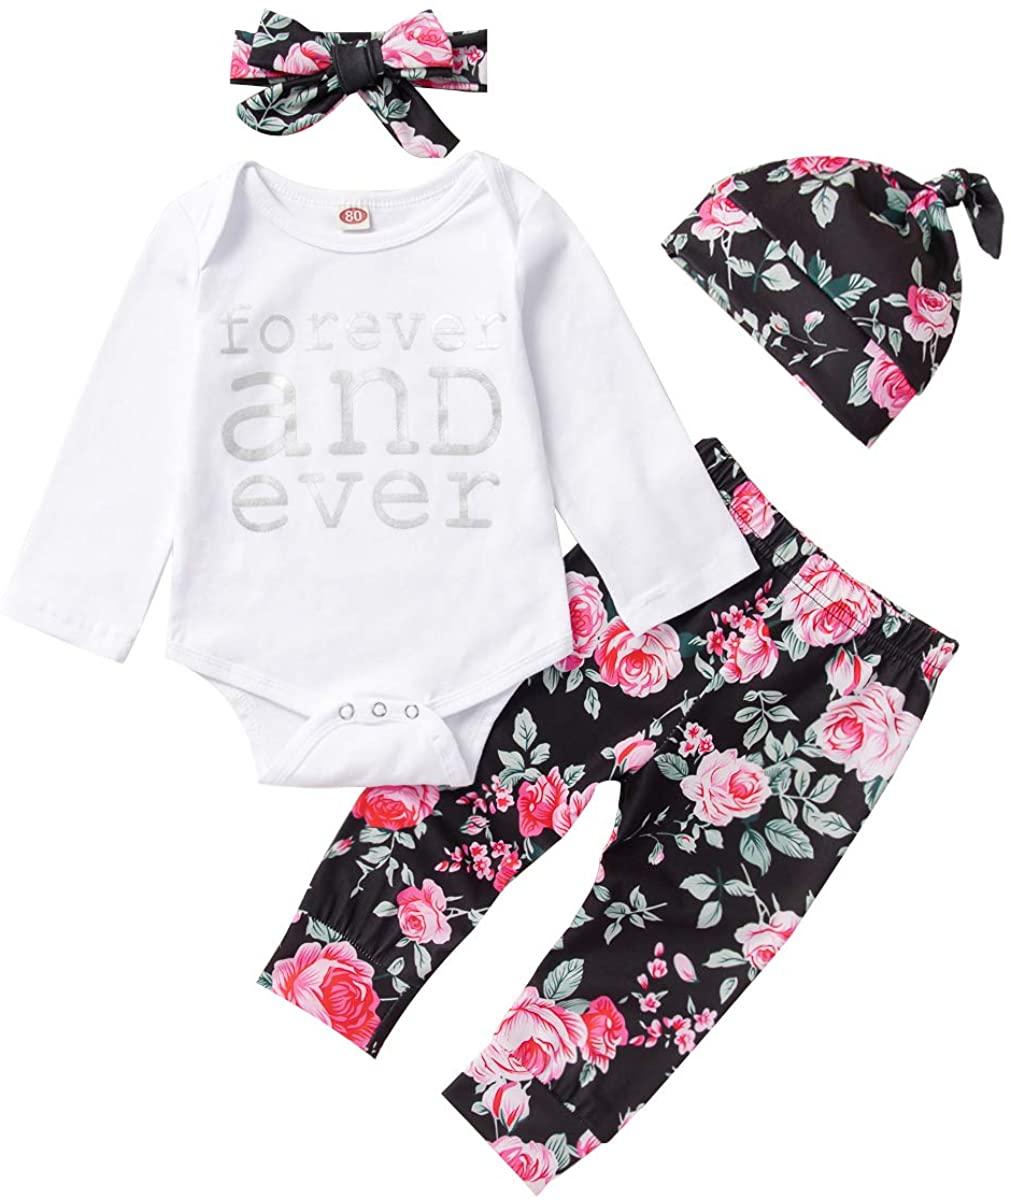 Infant Baby Girl Clothes Set Infant Outfits Cotton Romper Bodysuit Long Sleeve Floral Pants Bowknot Headband Hat 4Pcs